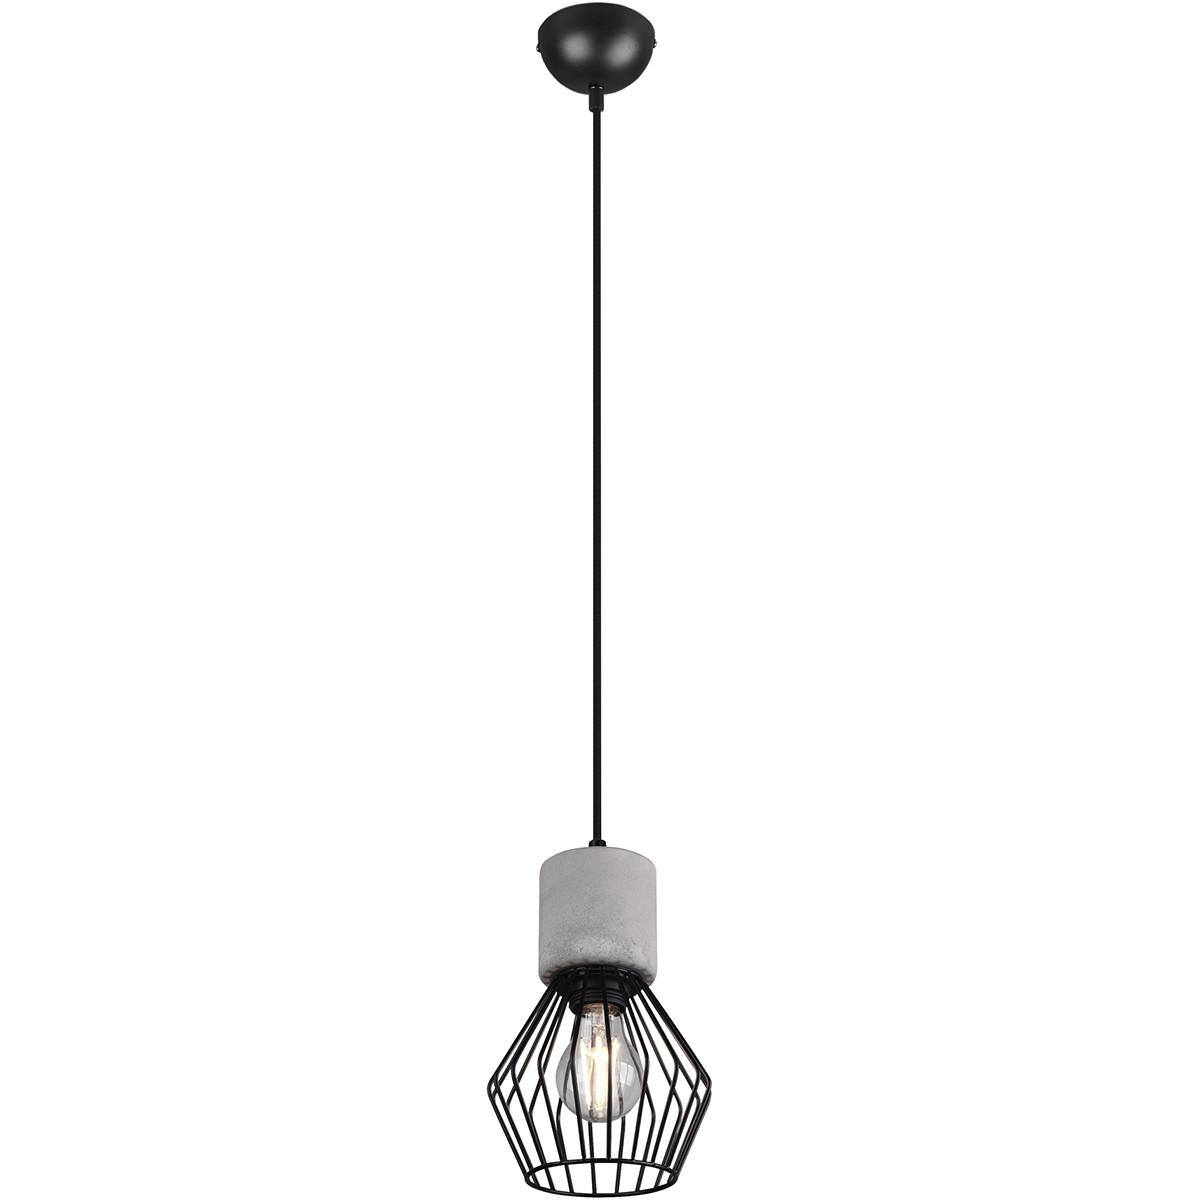 LED Hanglamp - Trion Jamo - E27 Fitting - 1-lichts - Rond - Mat Zwart - Aluminium